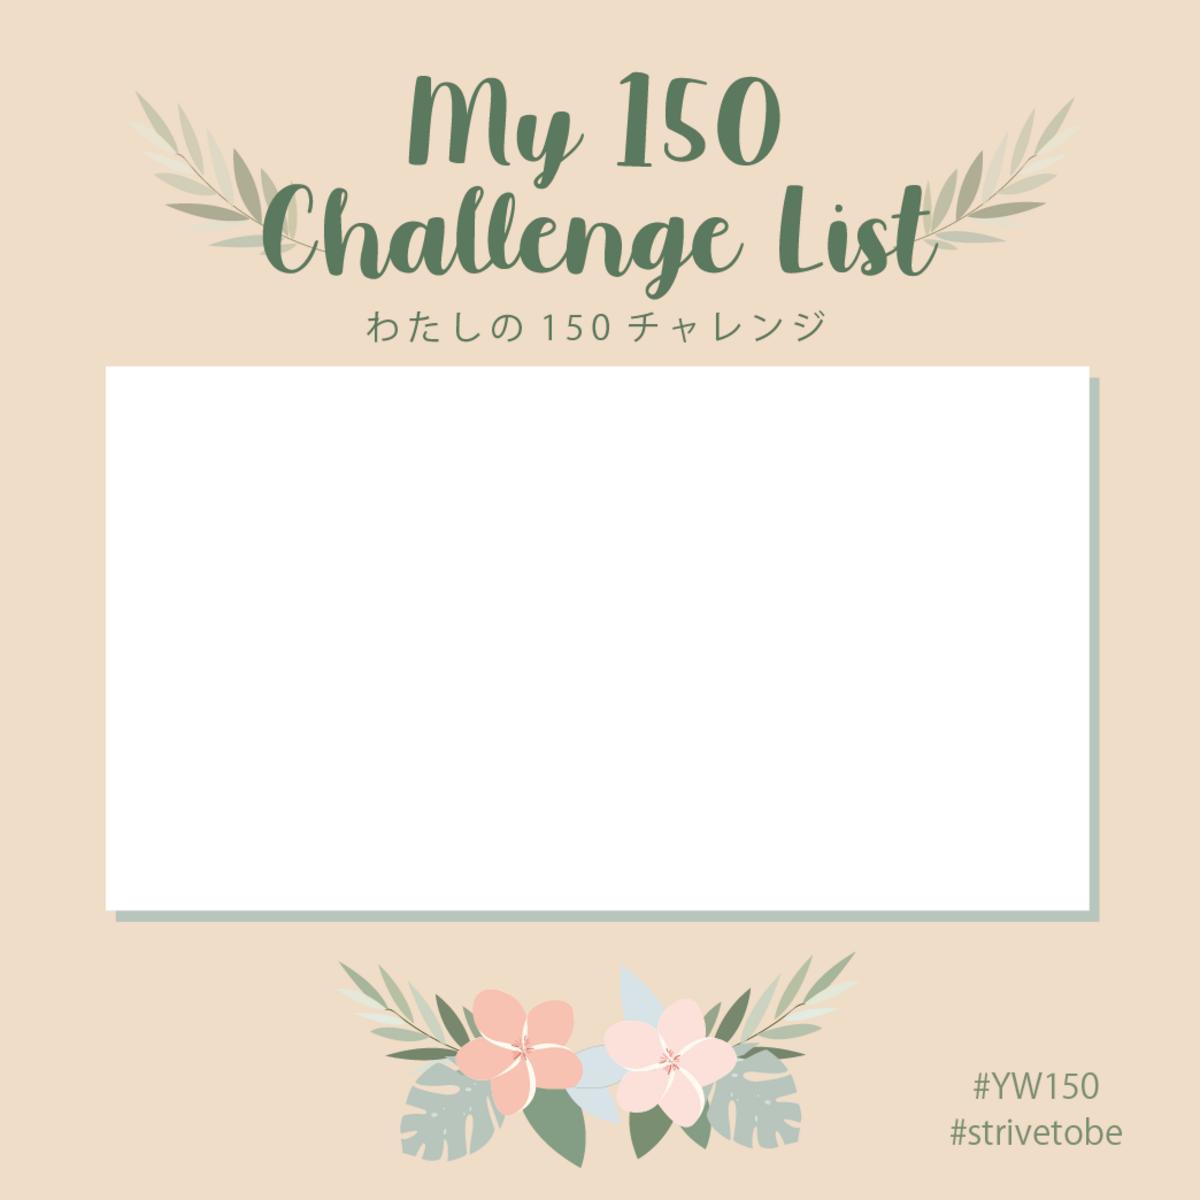 My 150 challenge